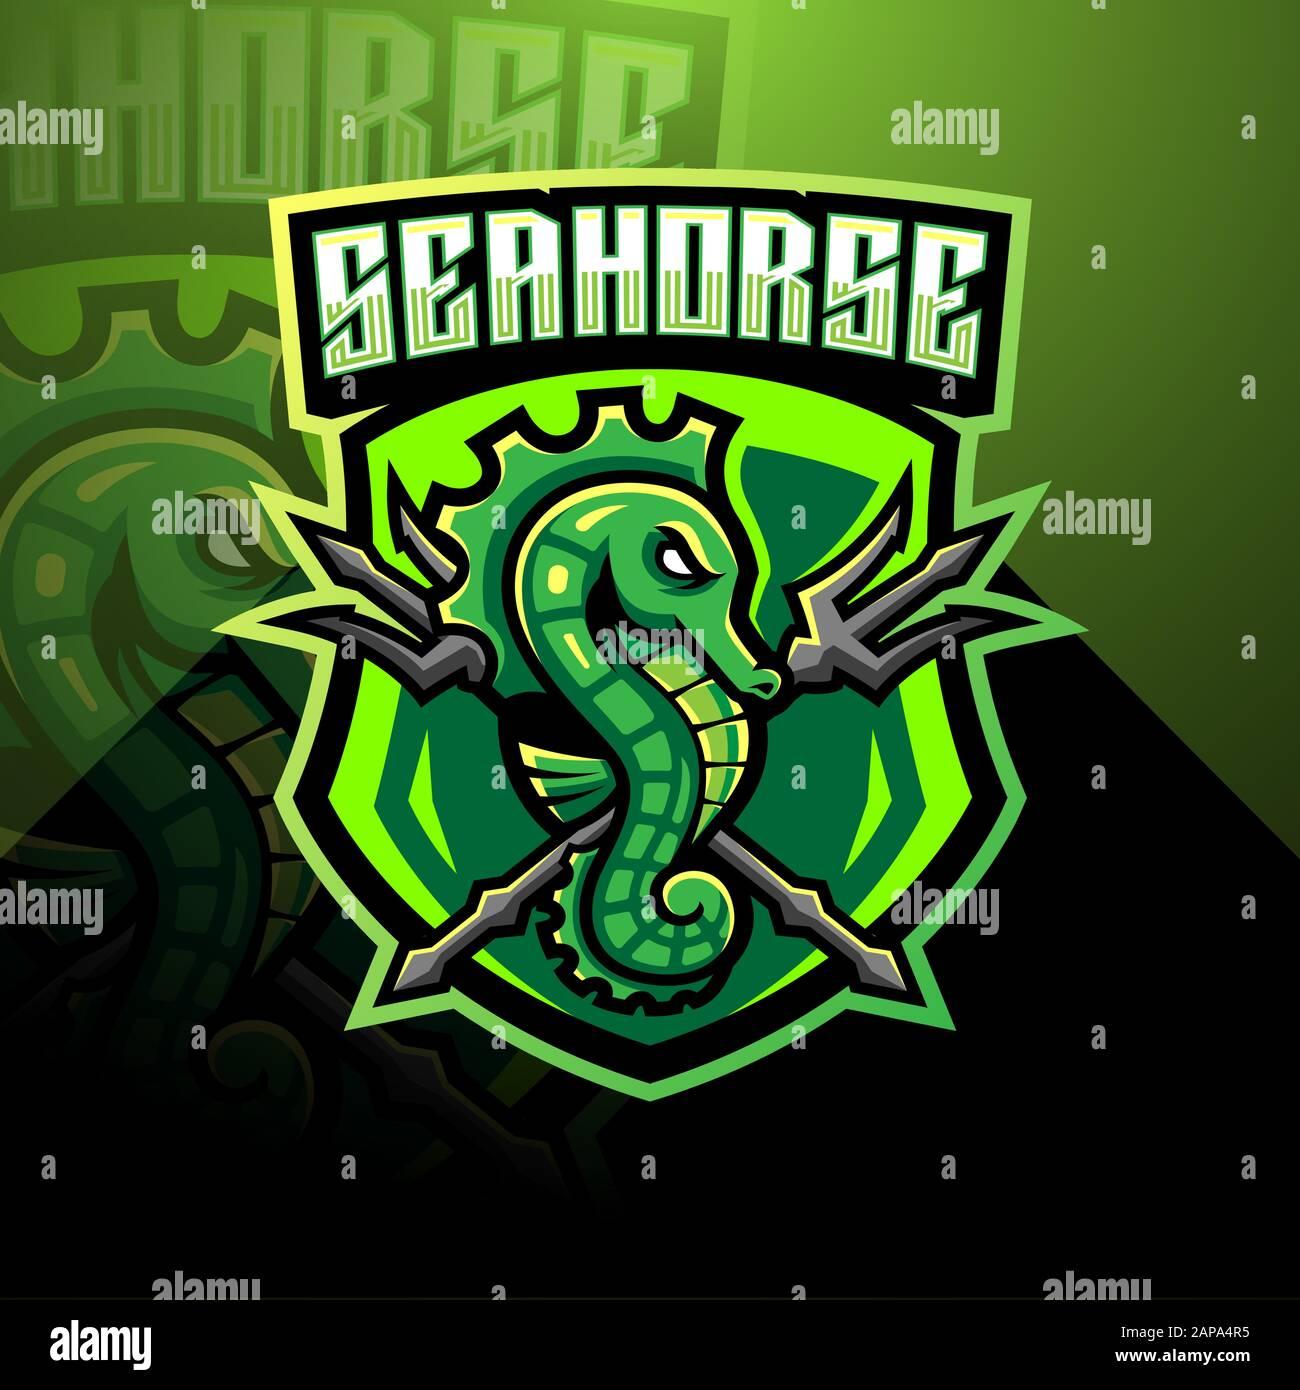 Seahorse Esport Mascot Logo Design Stock Vector Image Art Alamy